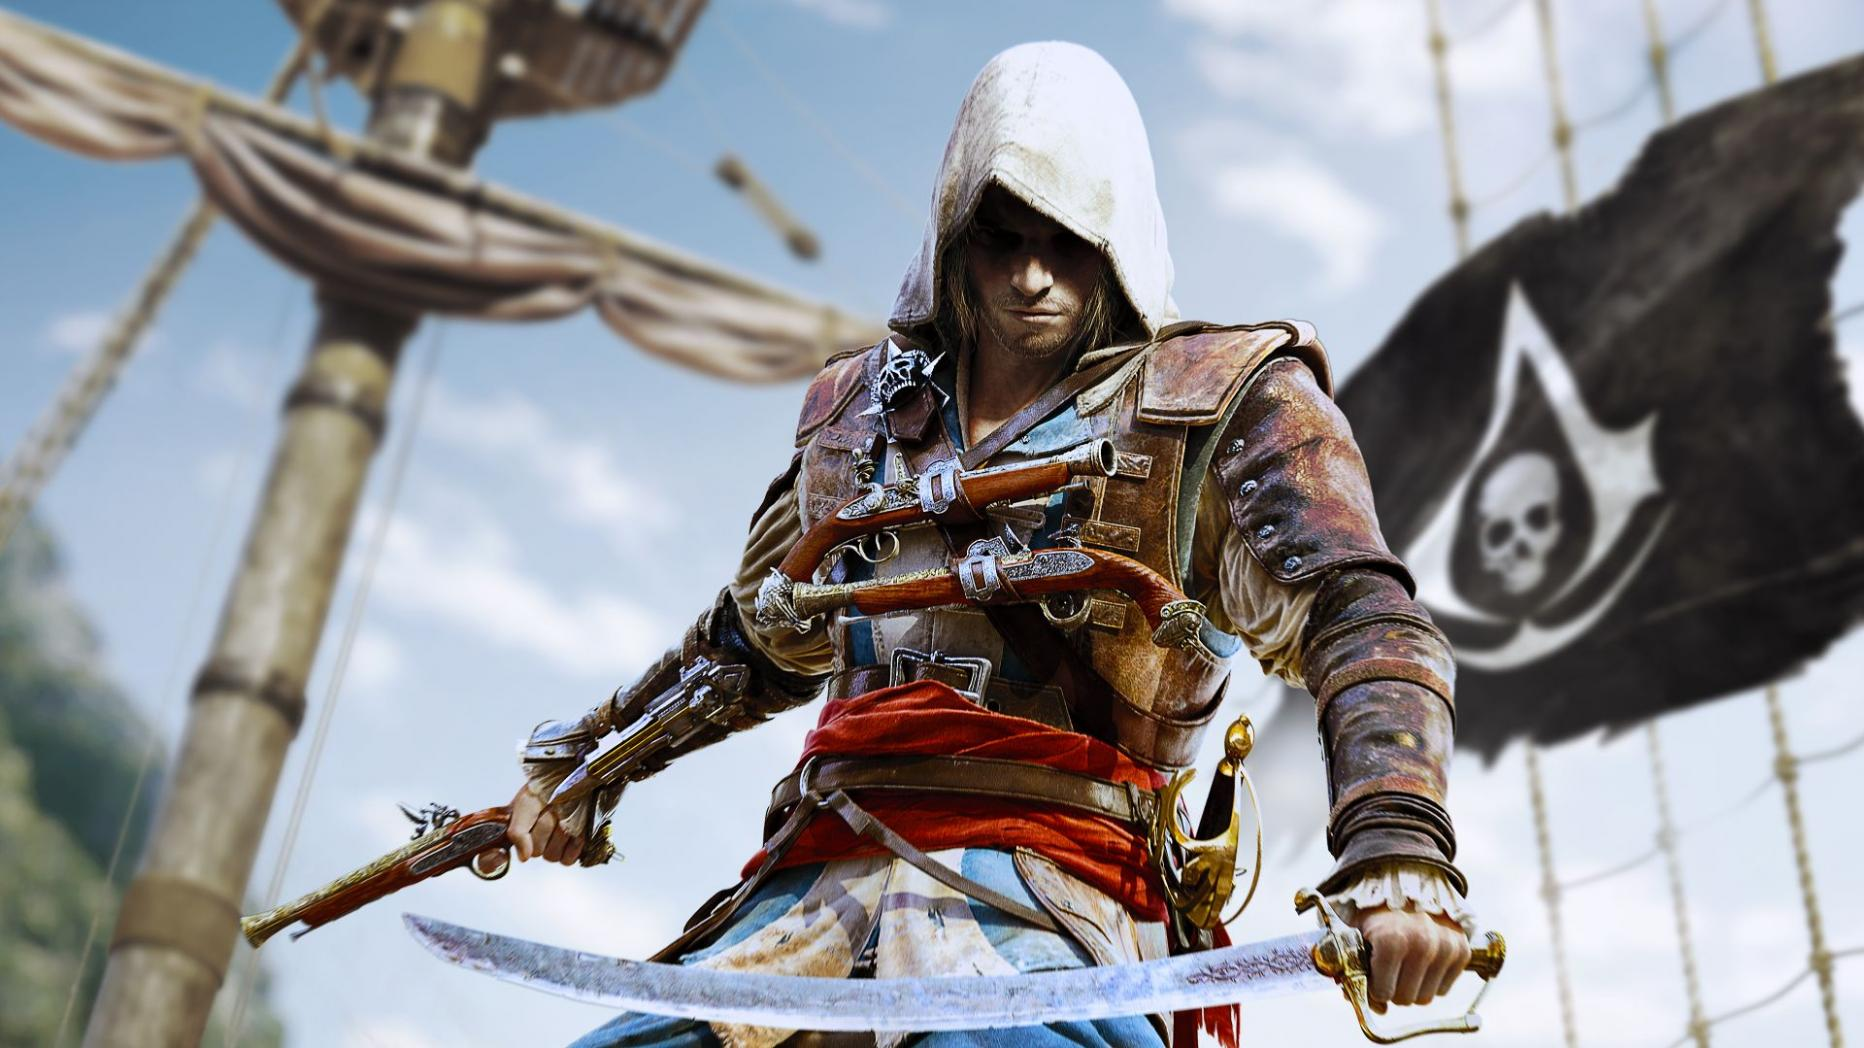 Ubisoft ofrece gratuitamente Assassin's Creed IV: Black Flag en PC